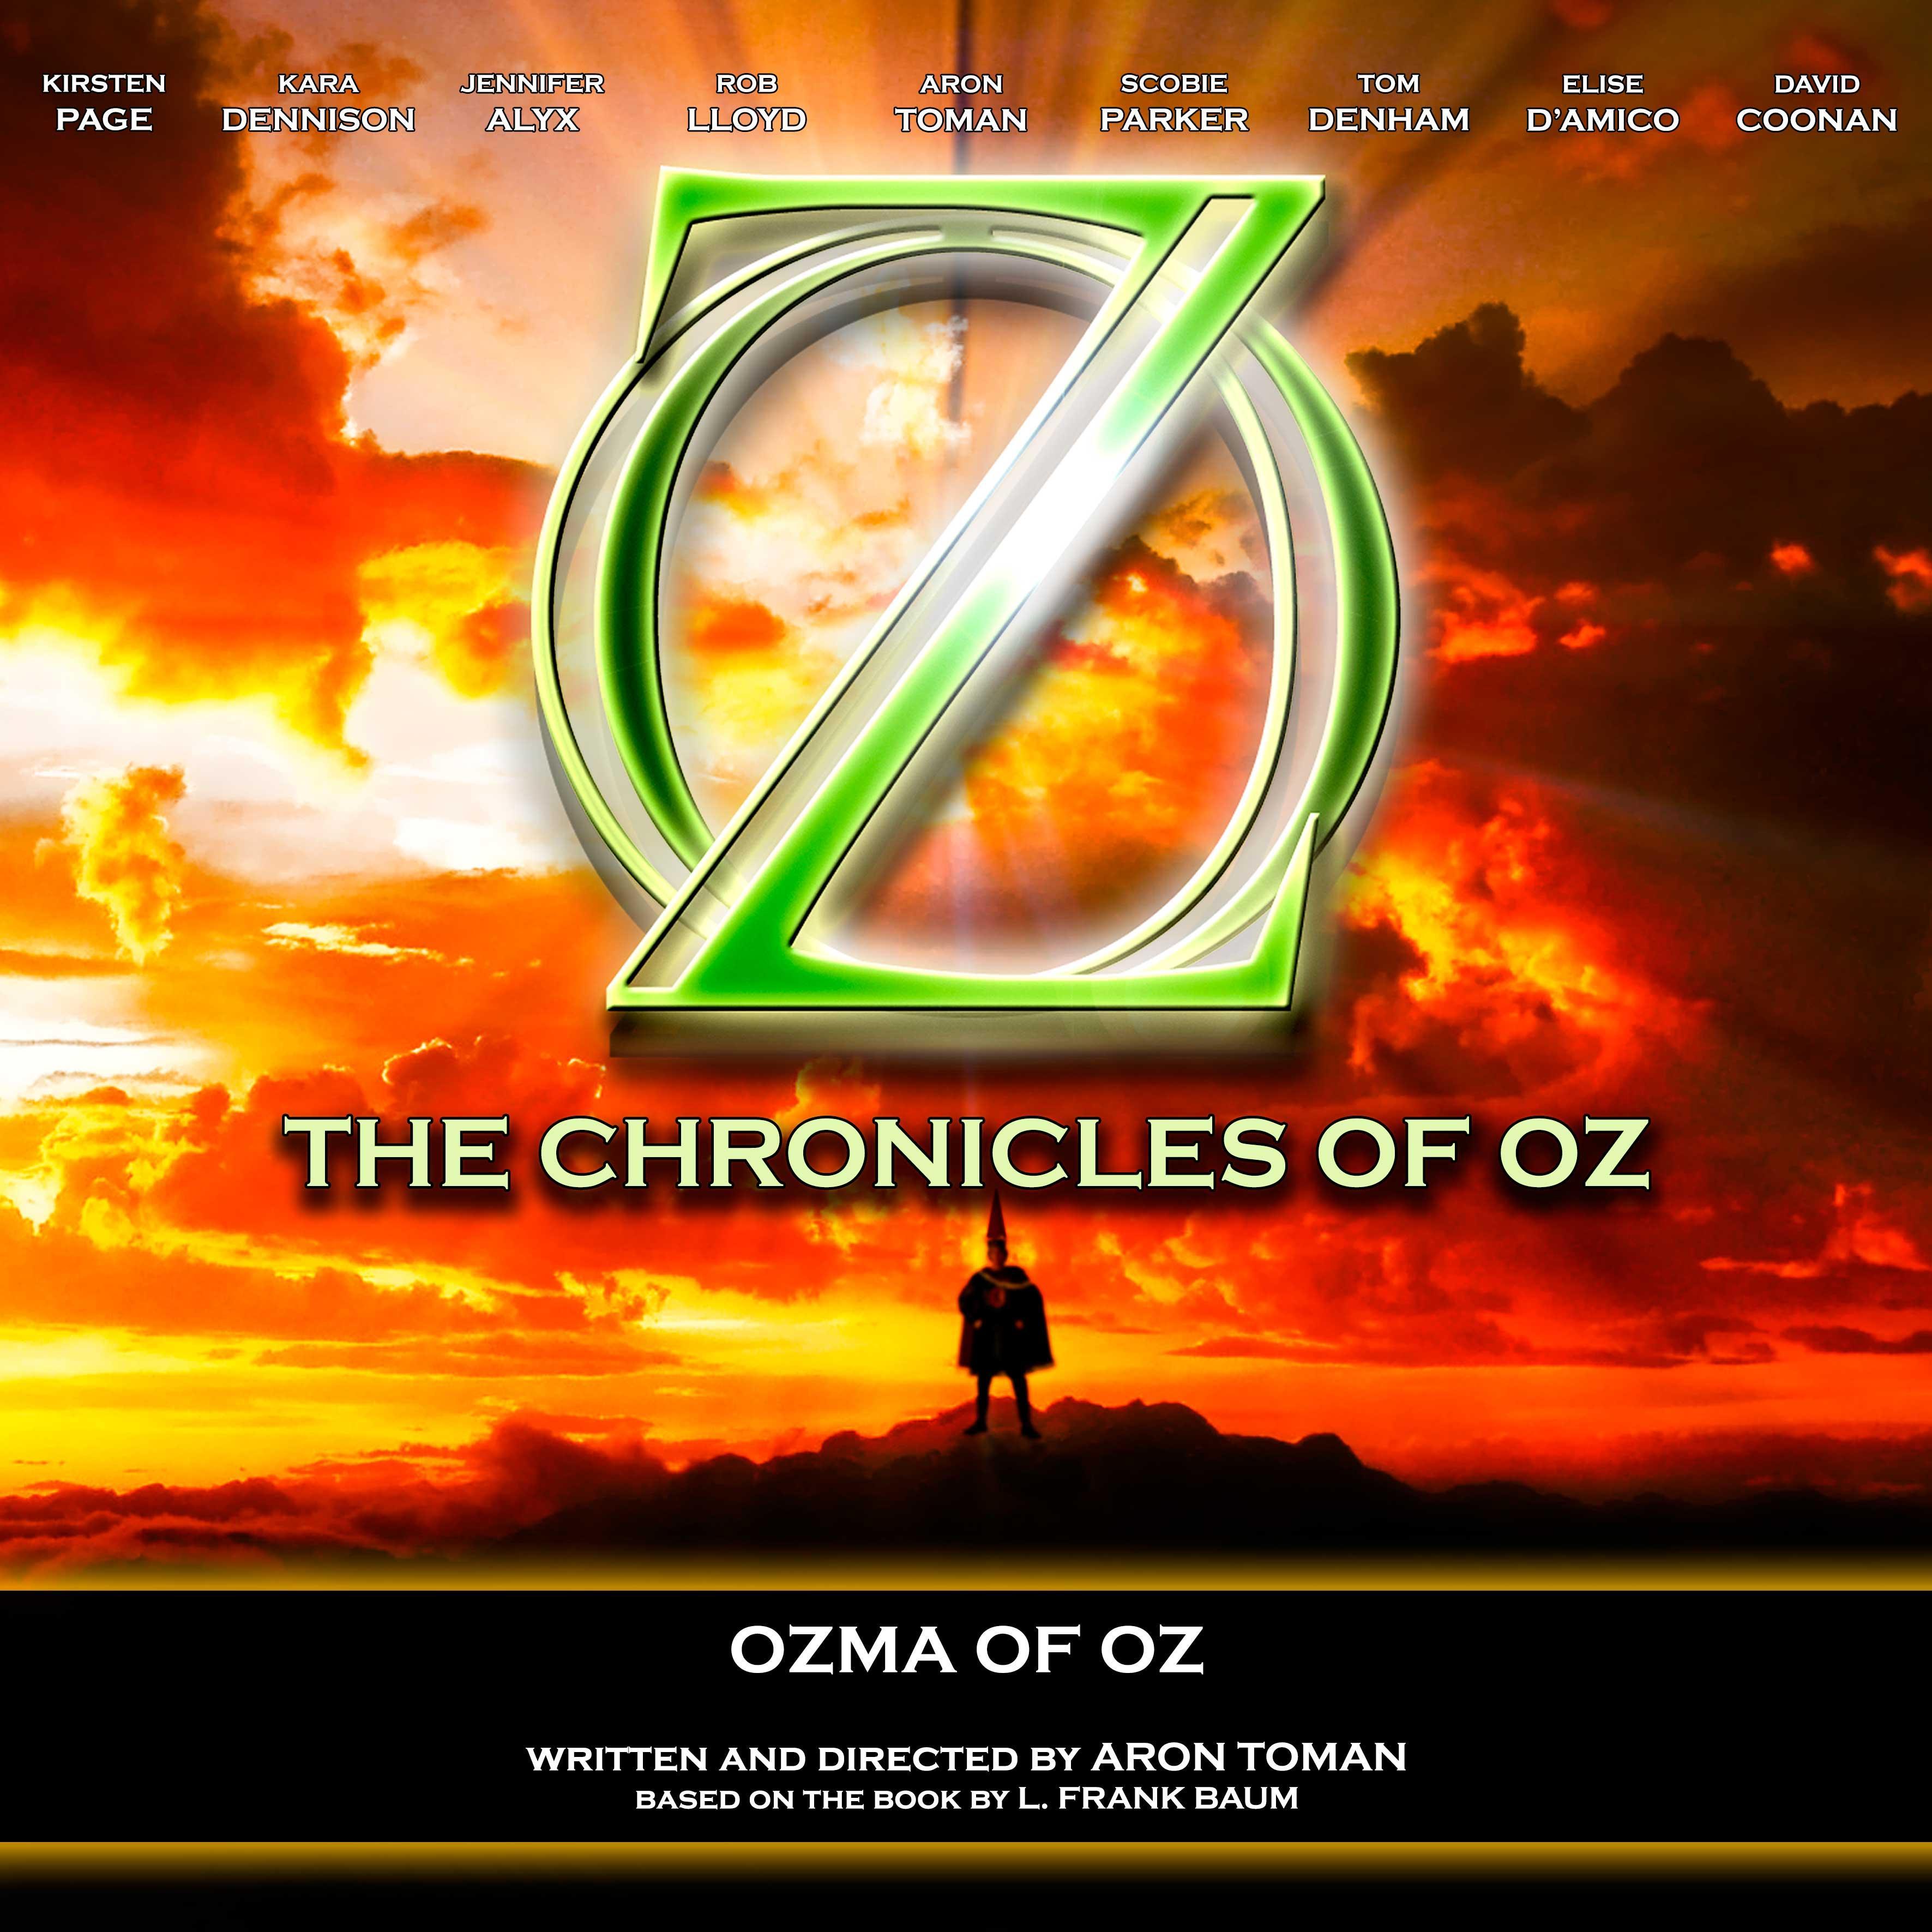 Ozma of Oz - Episode 6